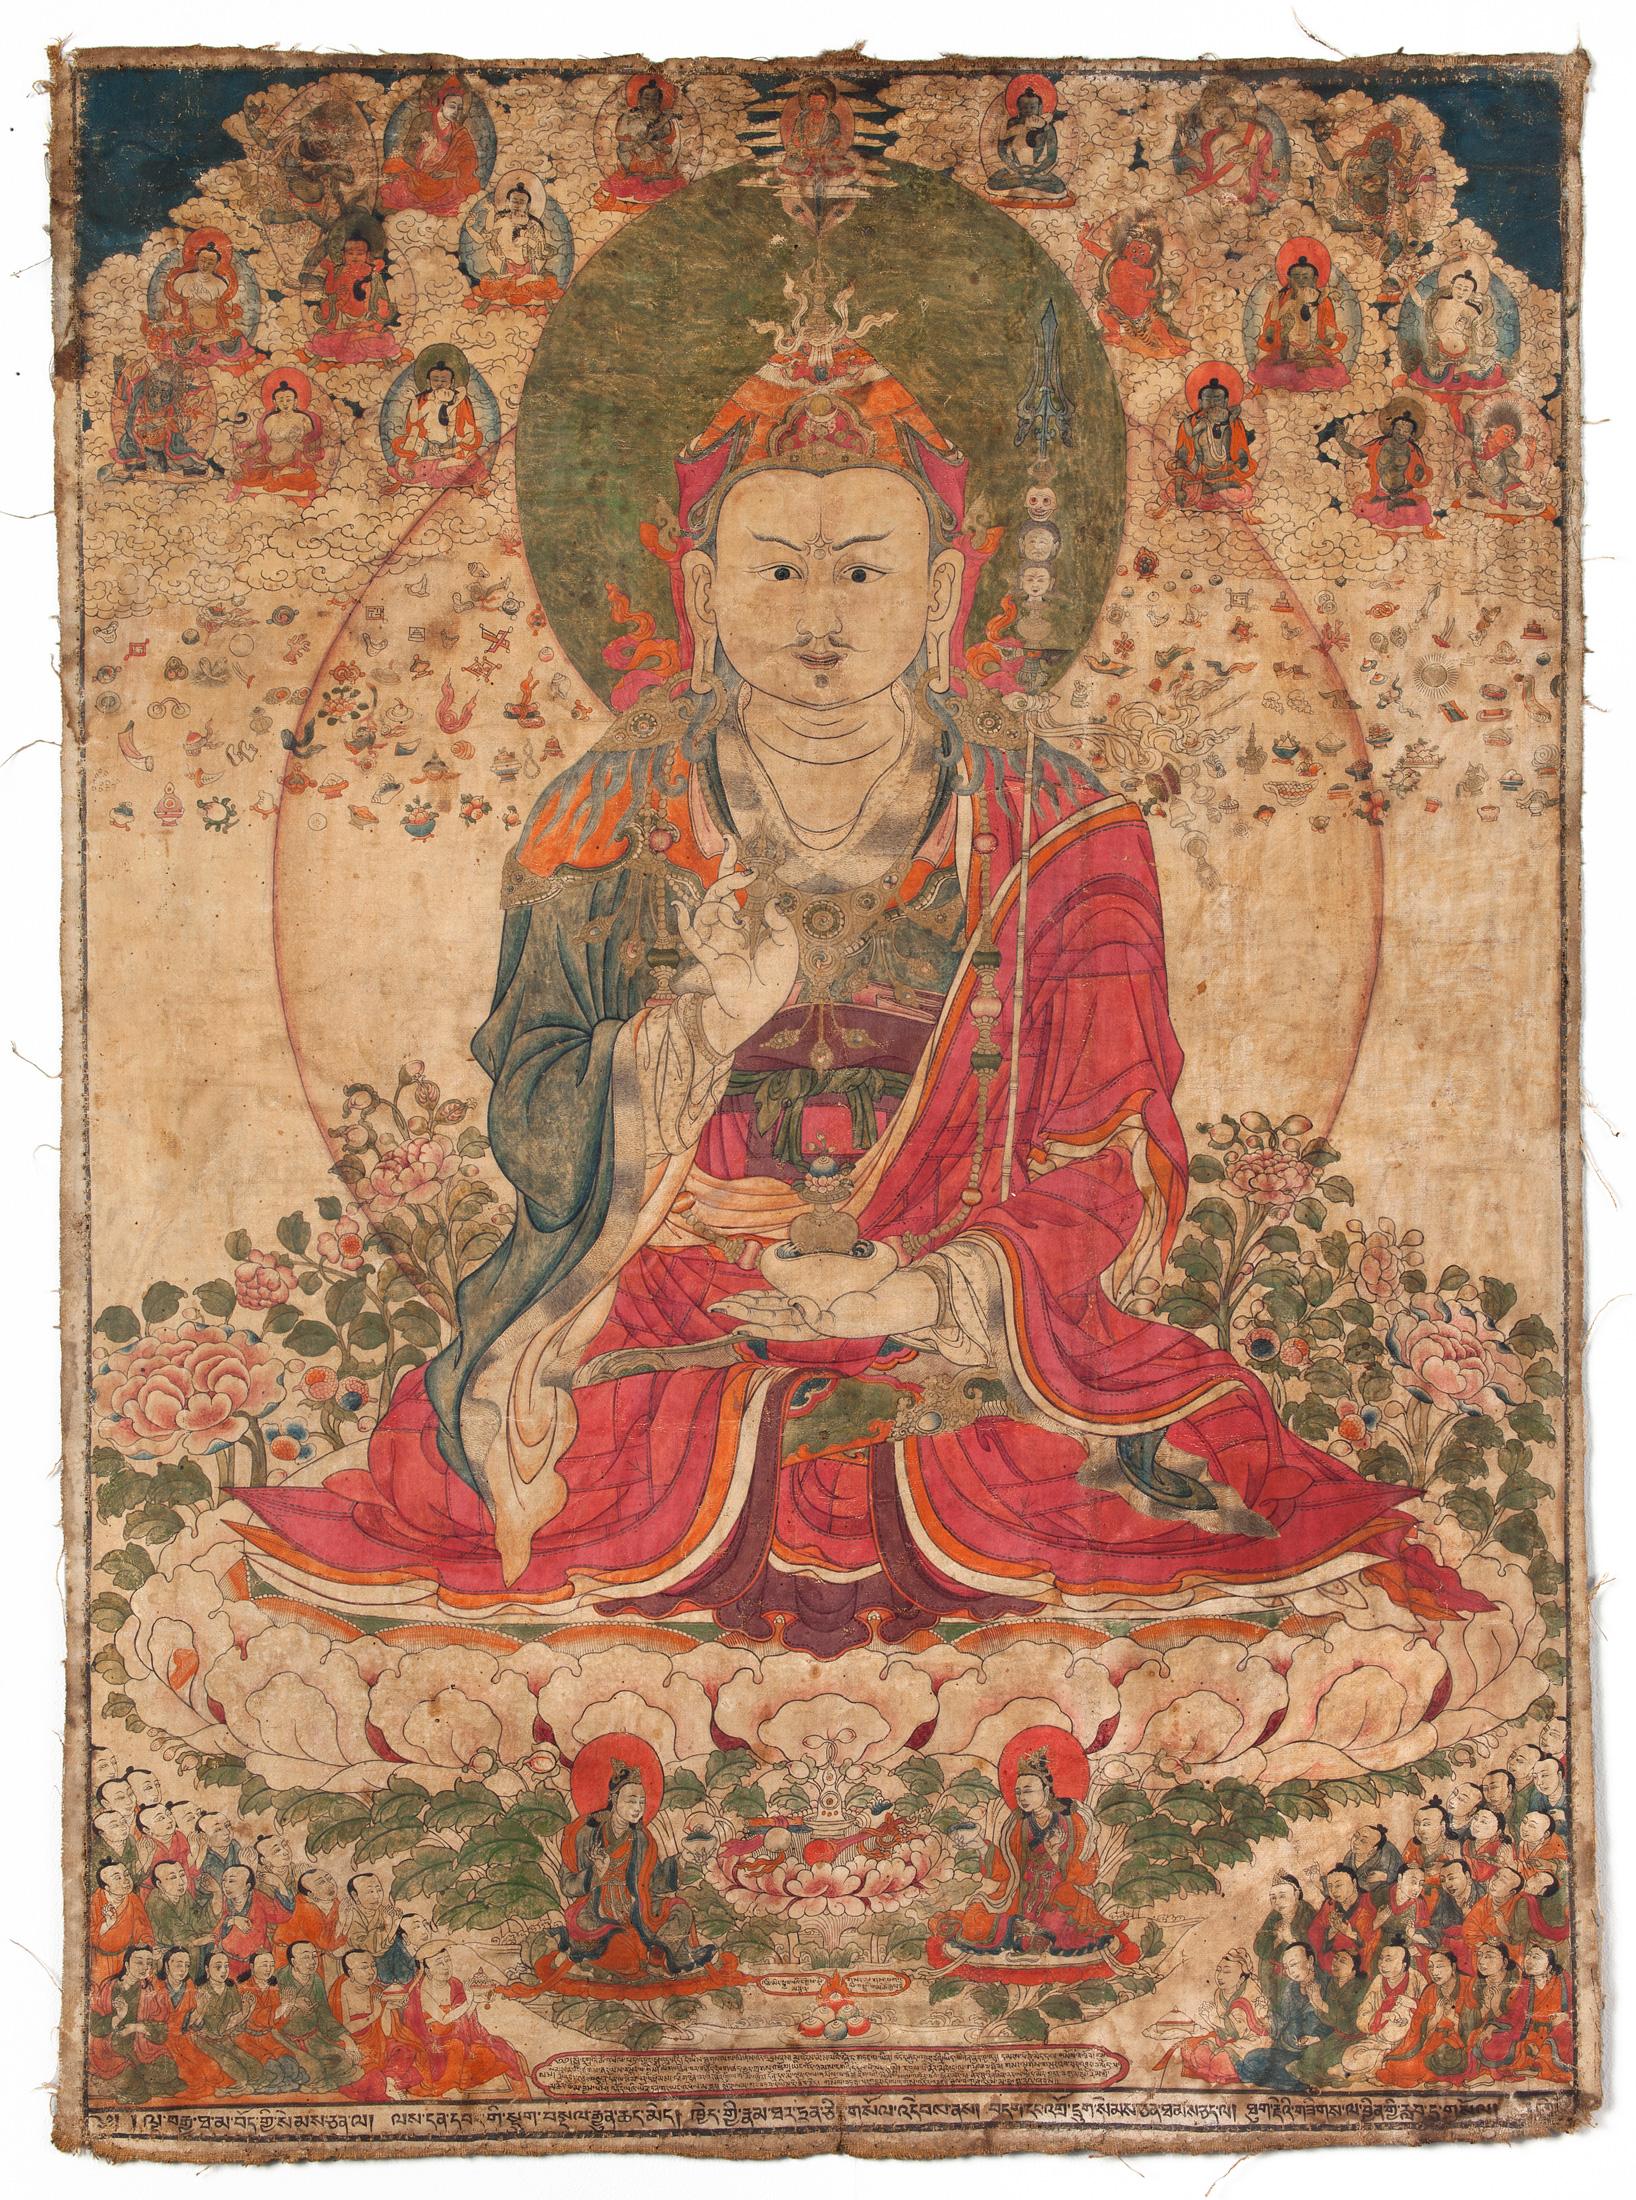 Padmasambhava, Tibet, 19th century, Ground mineral pigment on cloth, 36 1/4 x 28 1/4 inches, image courtesy Rubin Museum of Art